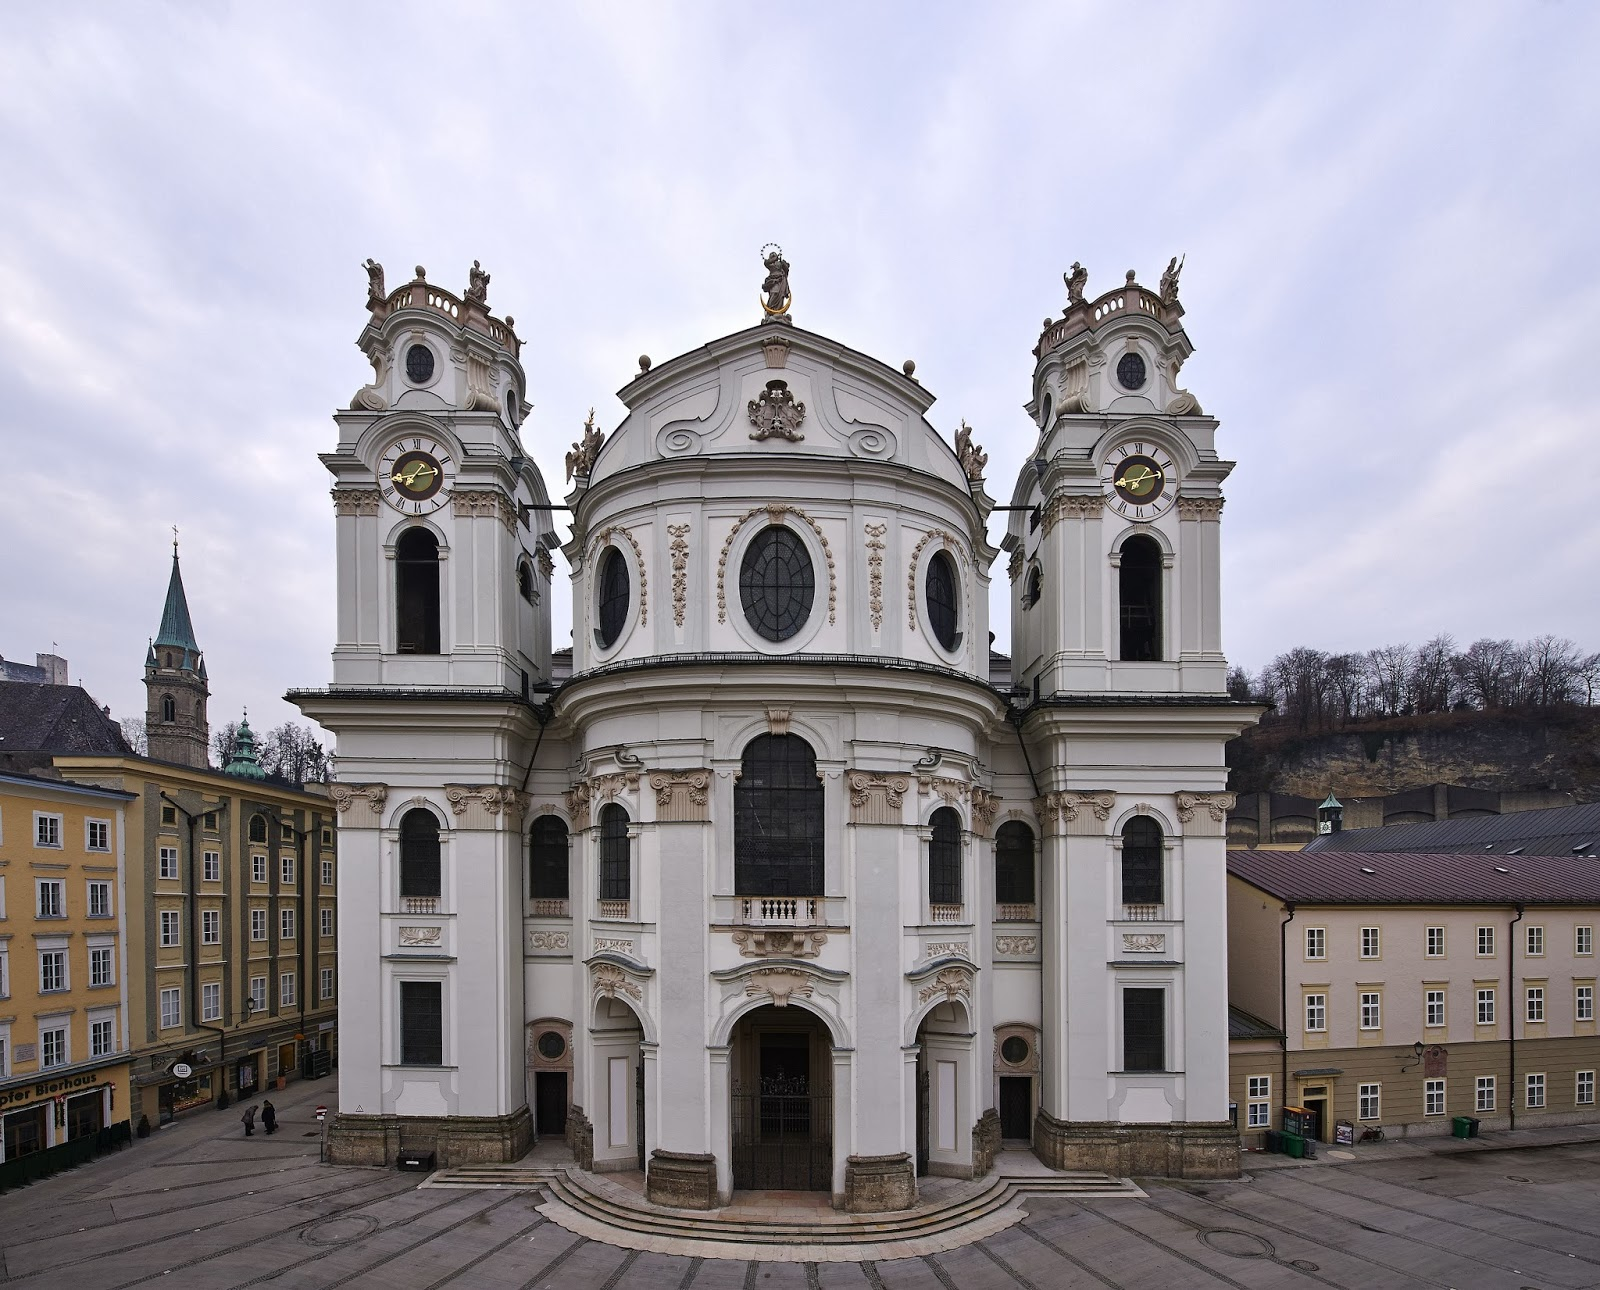 Architecture plan baroque architecture and baroque on for Baroque architecture examples